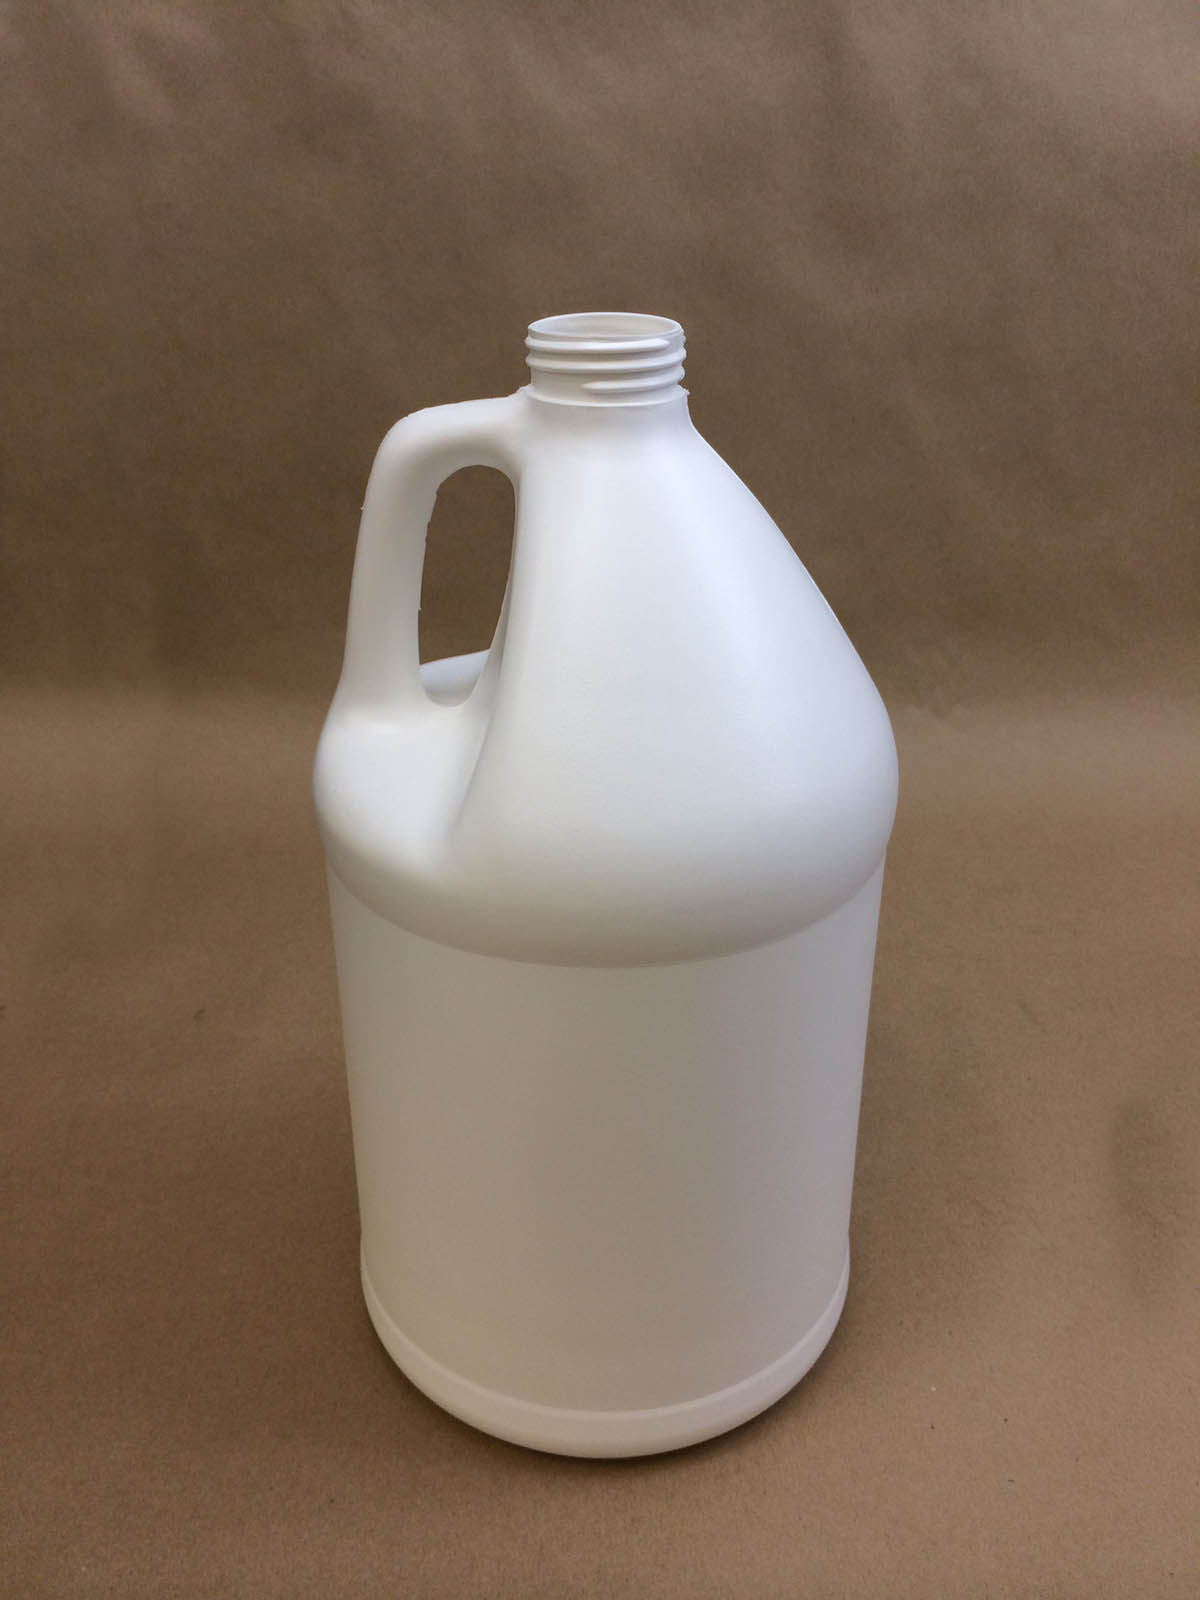 1 gallon (128 oz.) white plastic jug